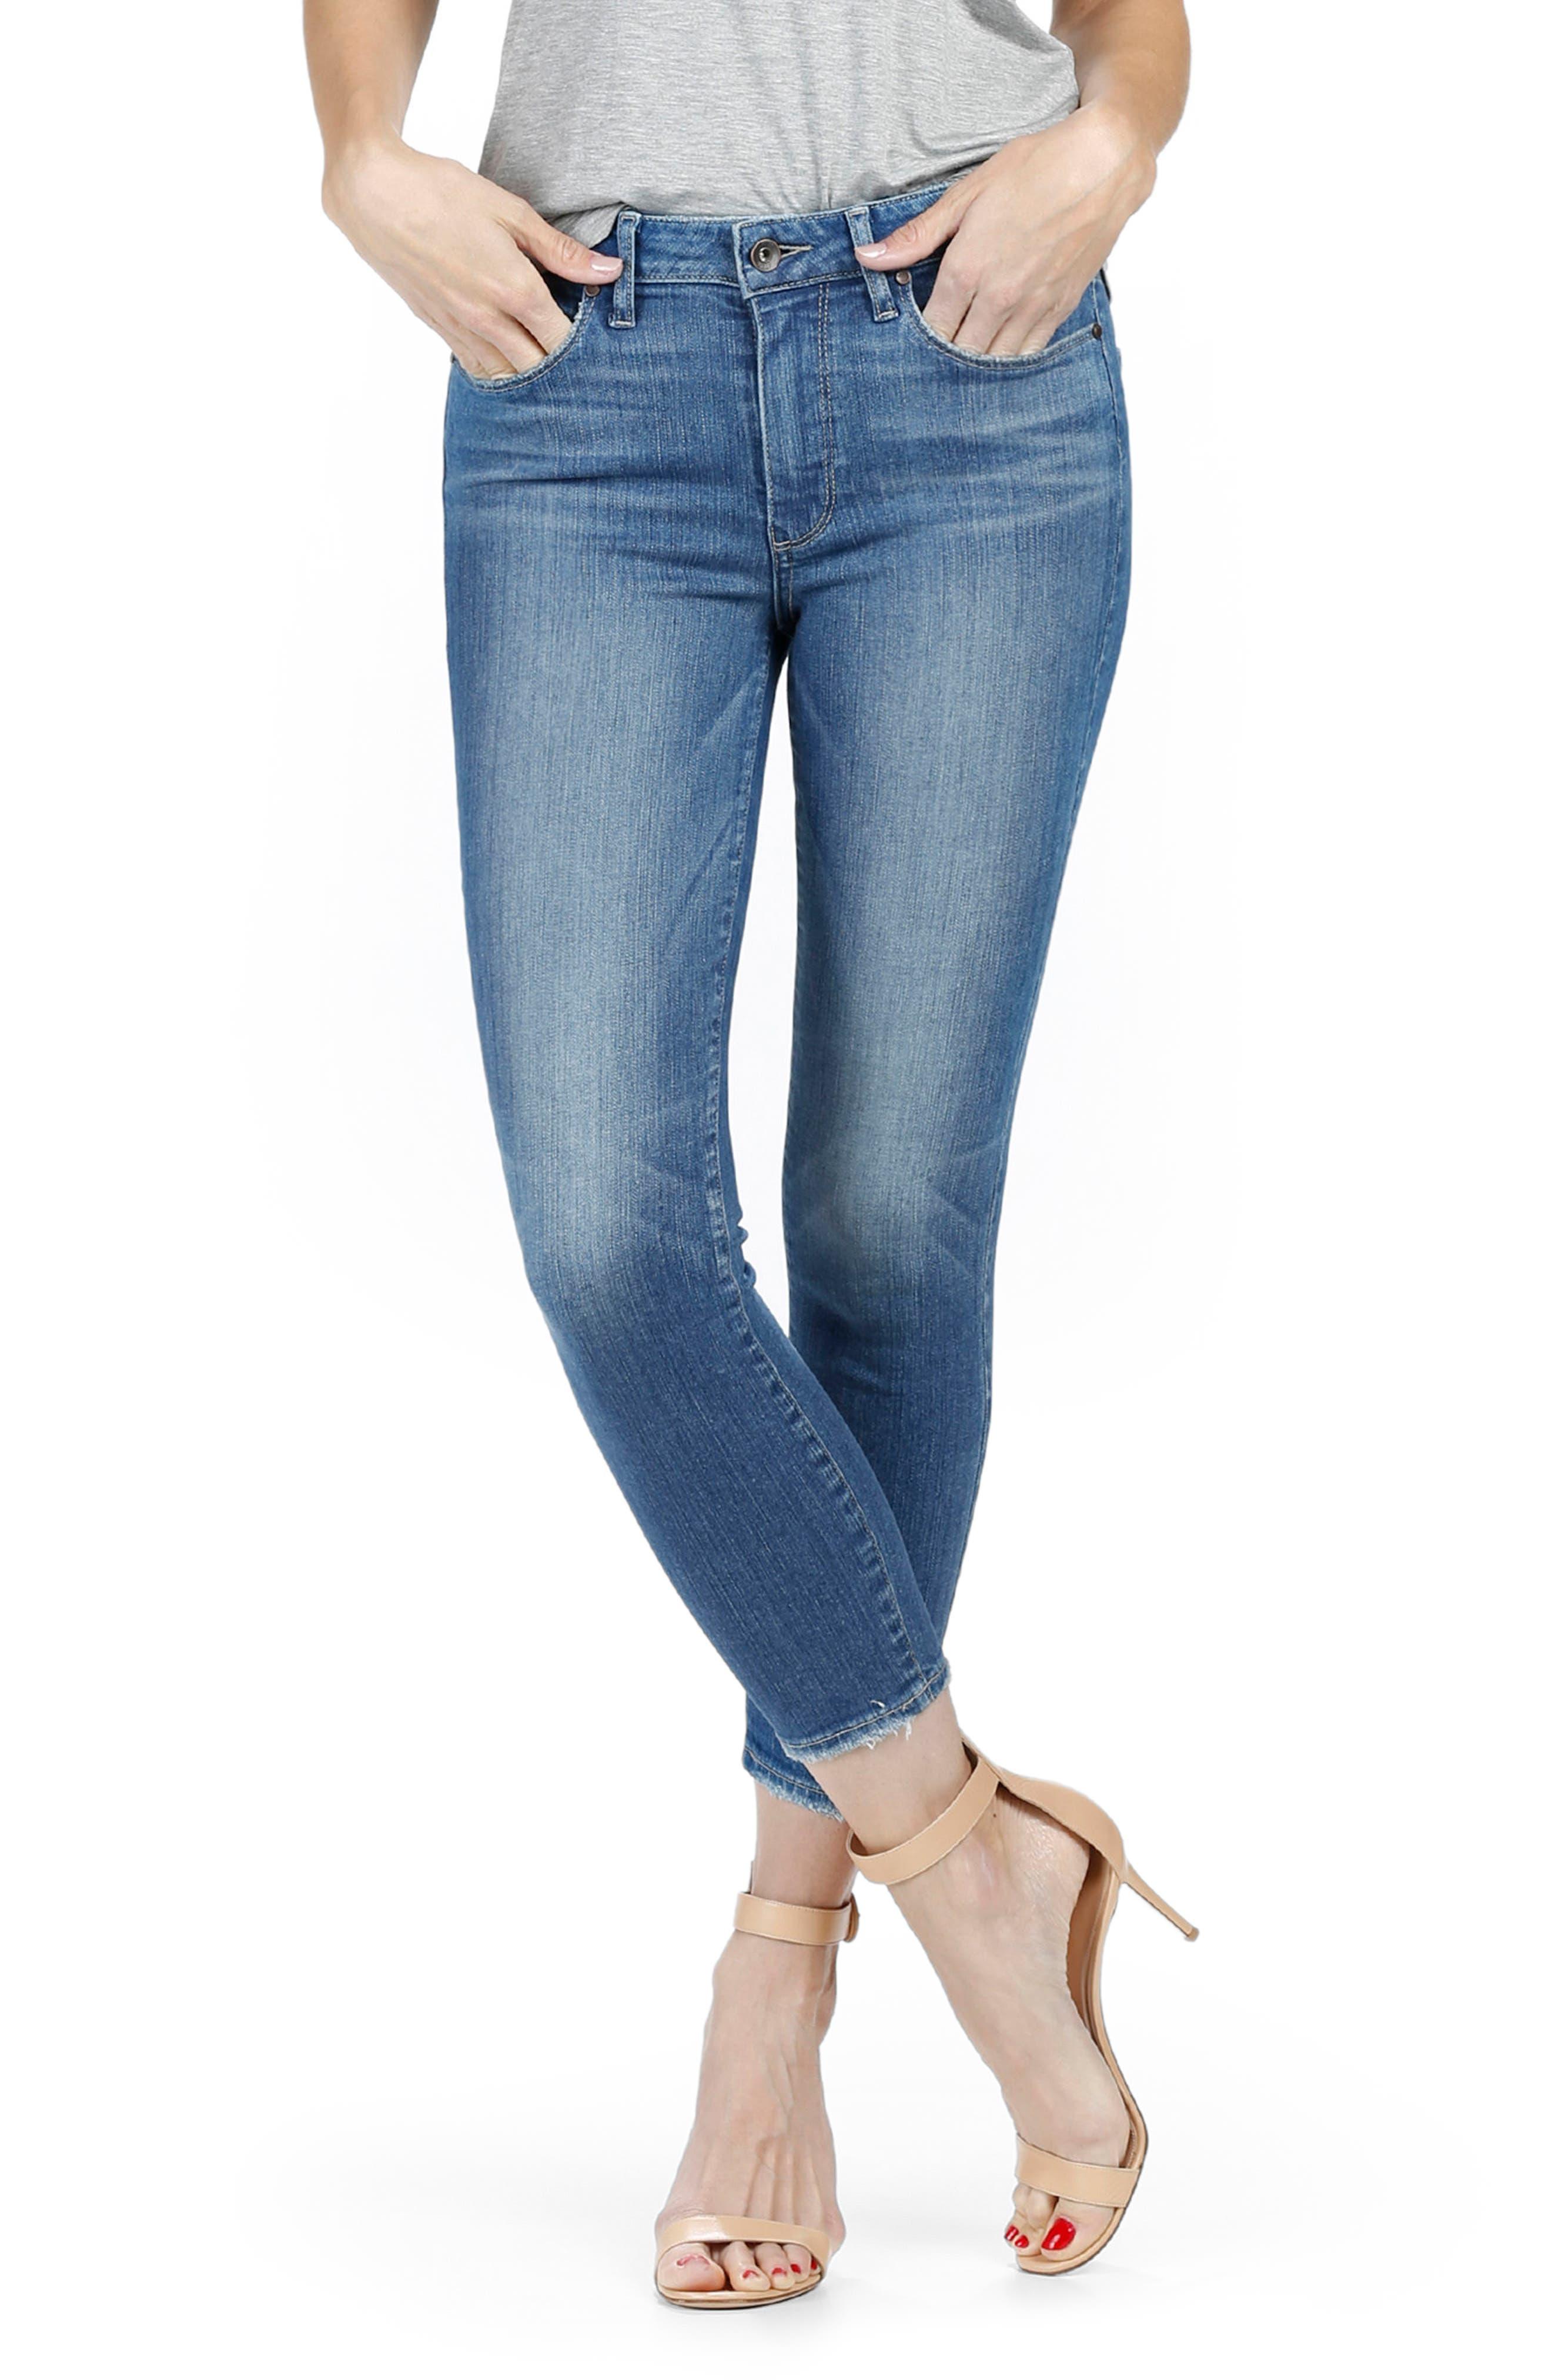 Verdugo Ultra Skinny Jeans,                             Main thumbnail 1, color,                             400